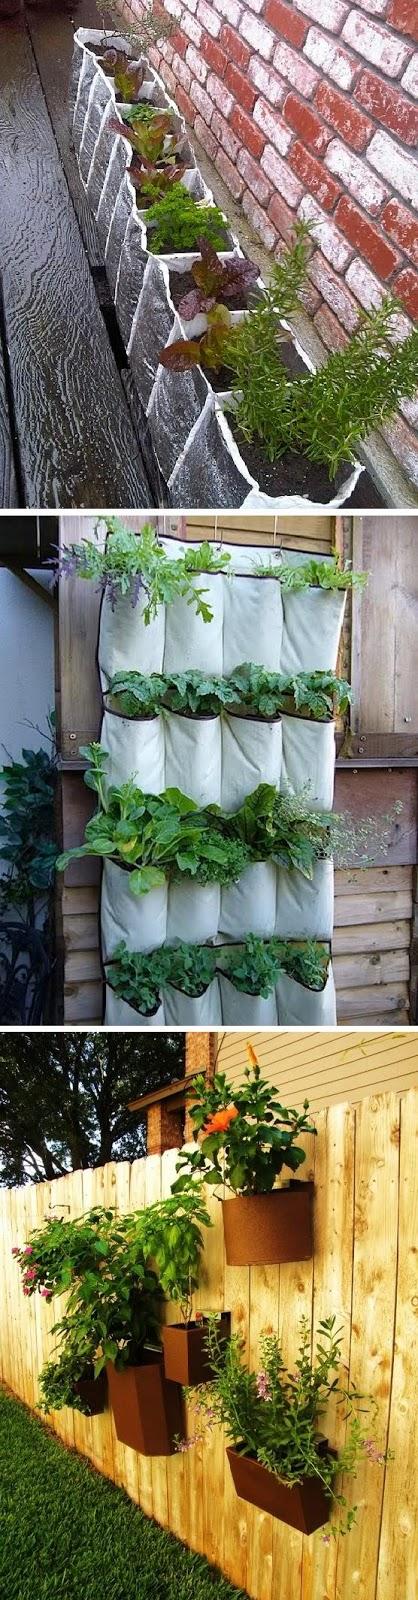 Herb garden inspiration and ideas for Garden inspiration ideas